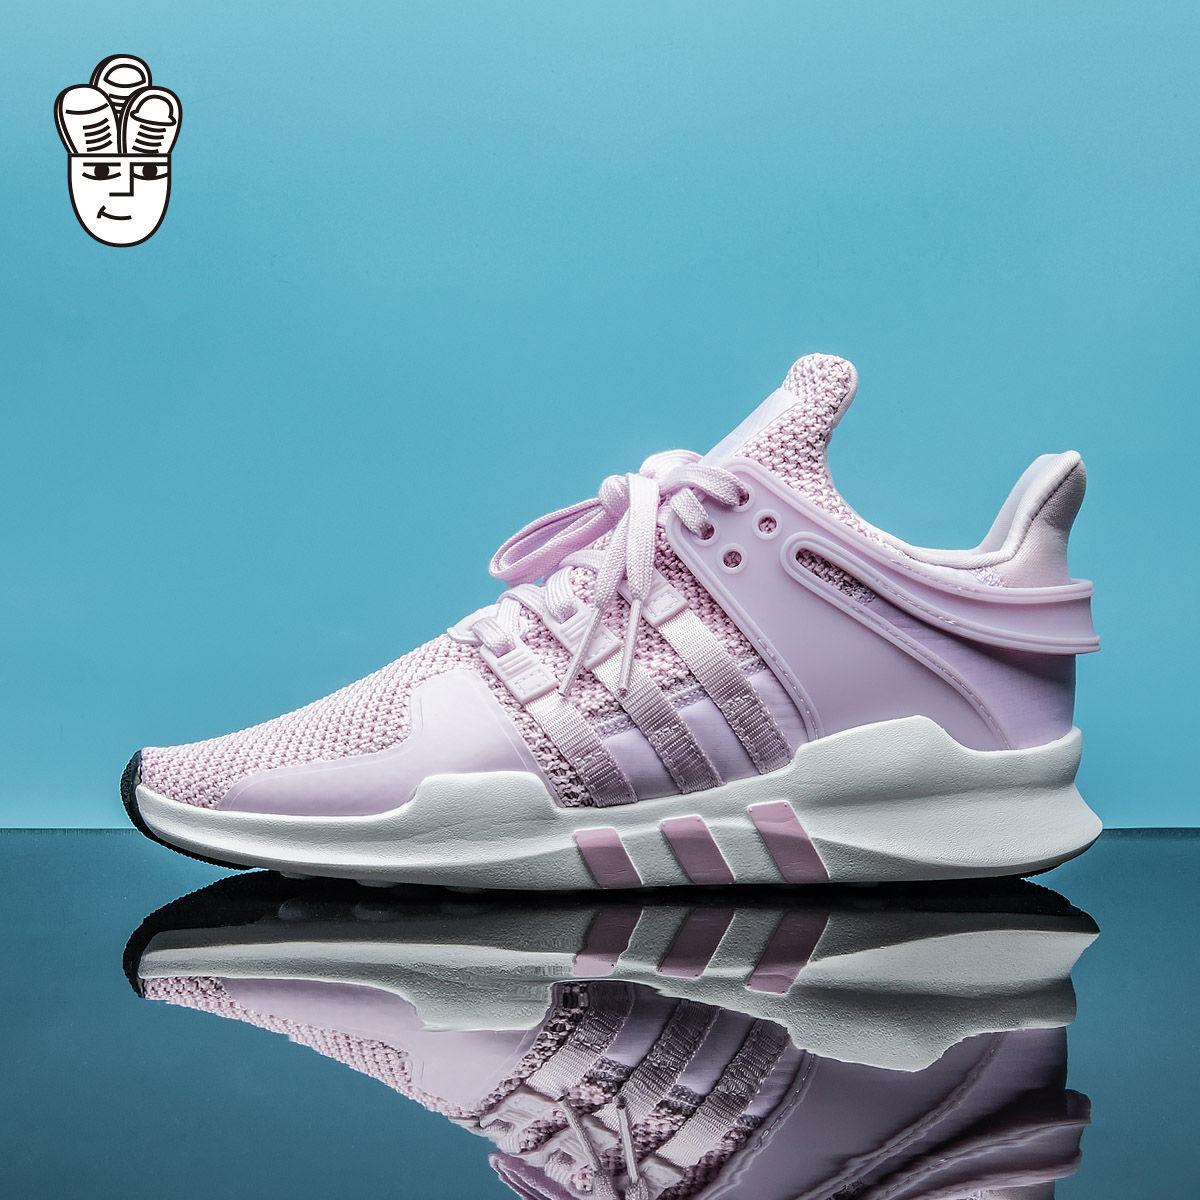 Adidas EQT Support ADV Snake 三叶草男鞋女鞋GS跑步鞋 运动鞋